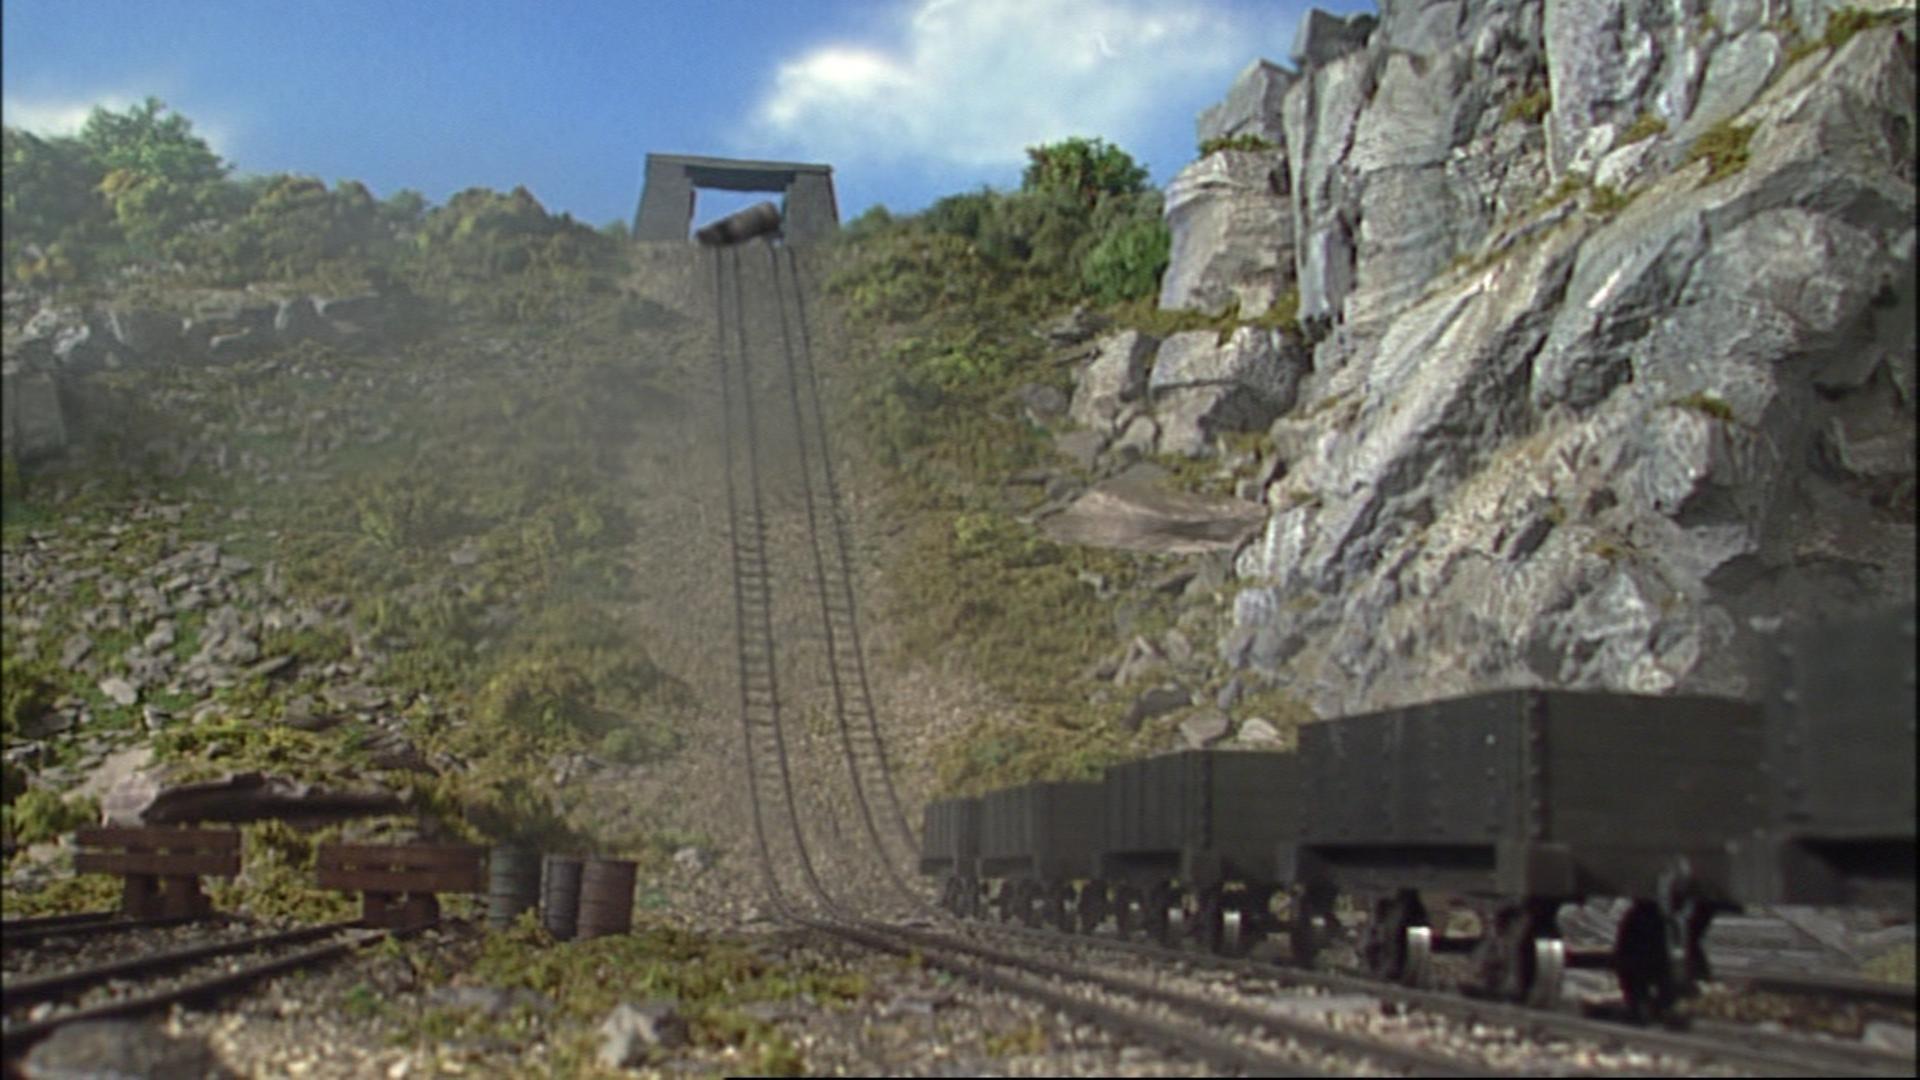 Skarloey Coal Yard